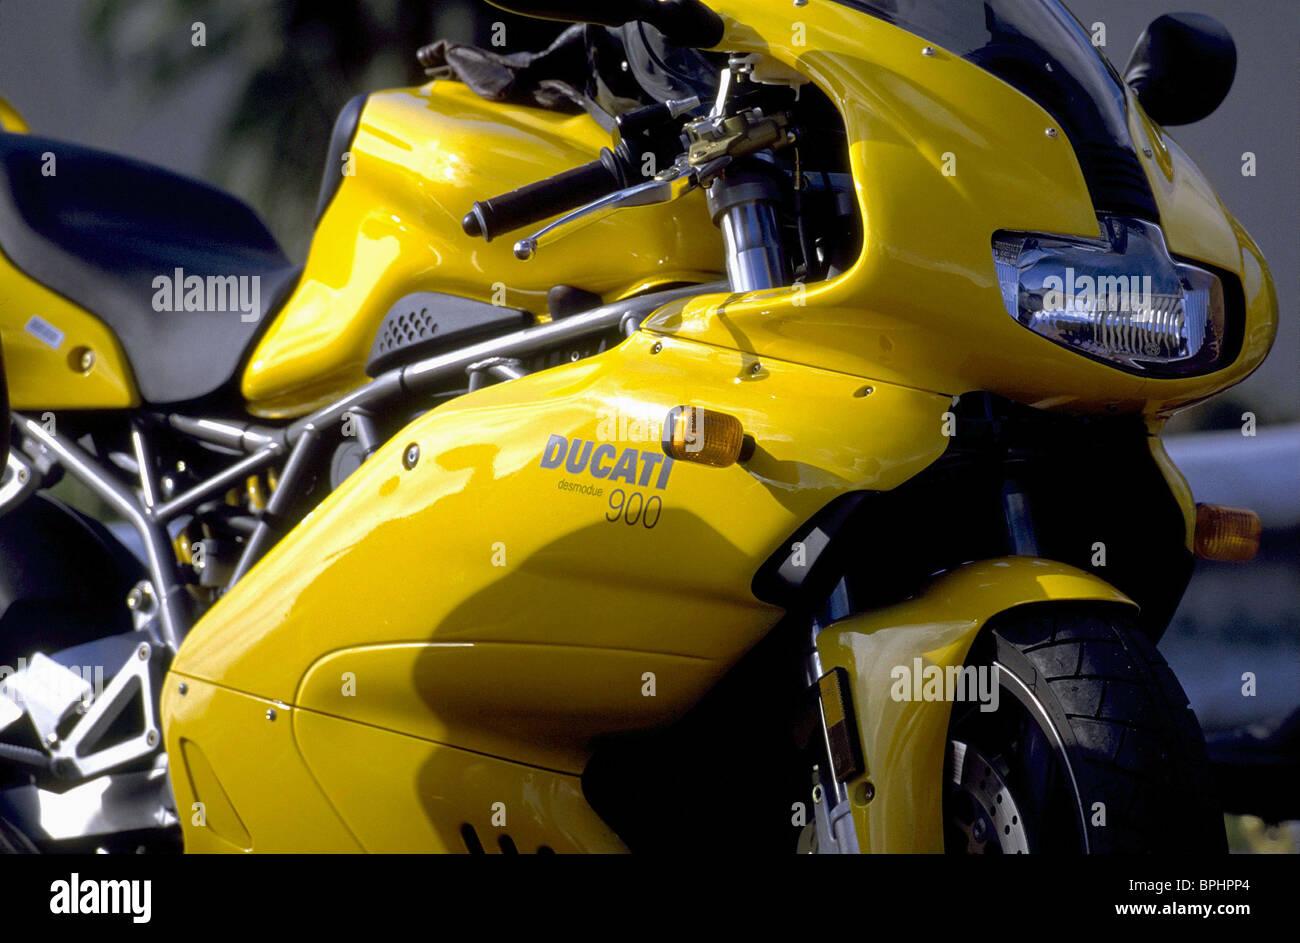 DUCATI 900 MOTORBIKE ROLLERBALL (2002) - Stock Image